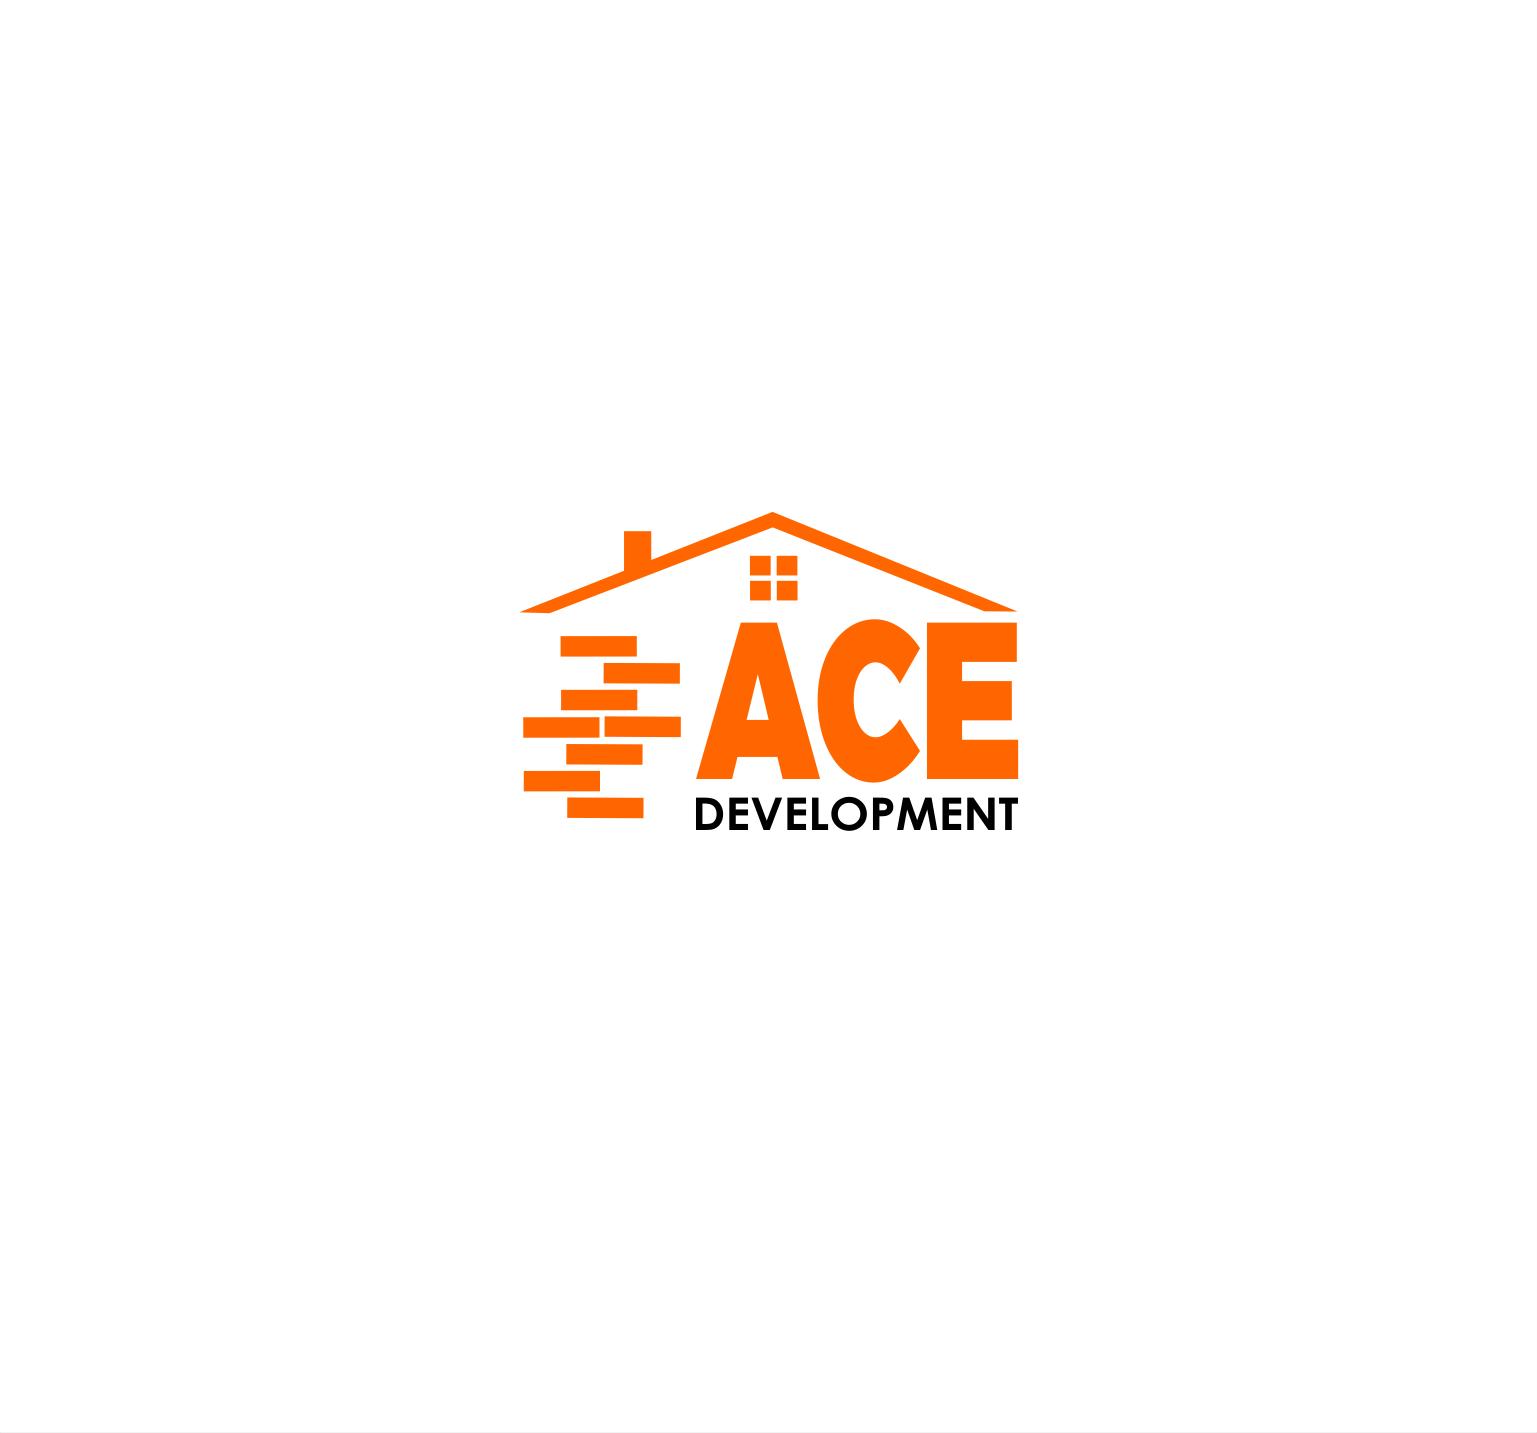 Logo Design by 354studio - Entry No. 49 in the Logo Design Contest Fun Logo Design for Ace development.